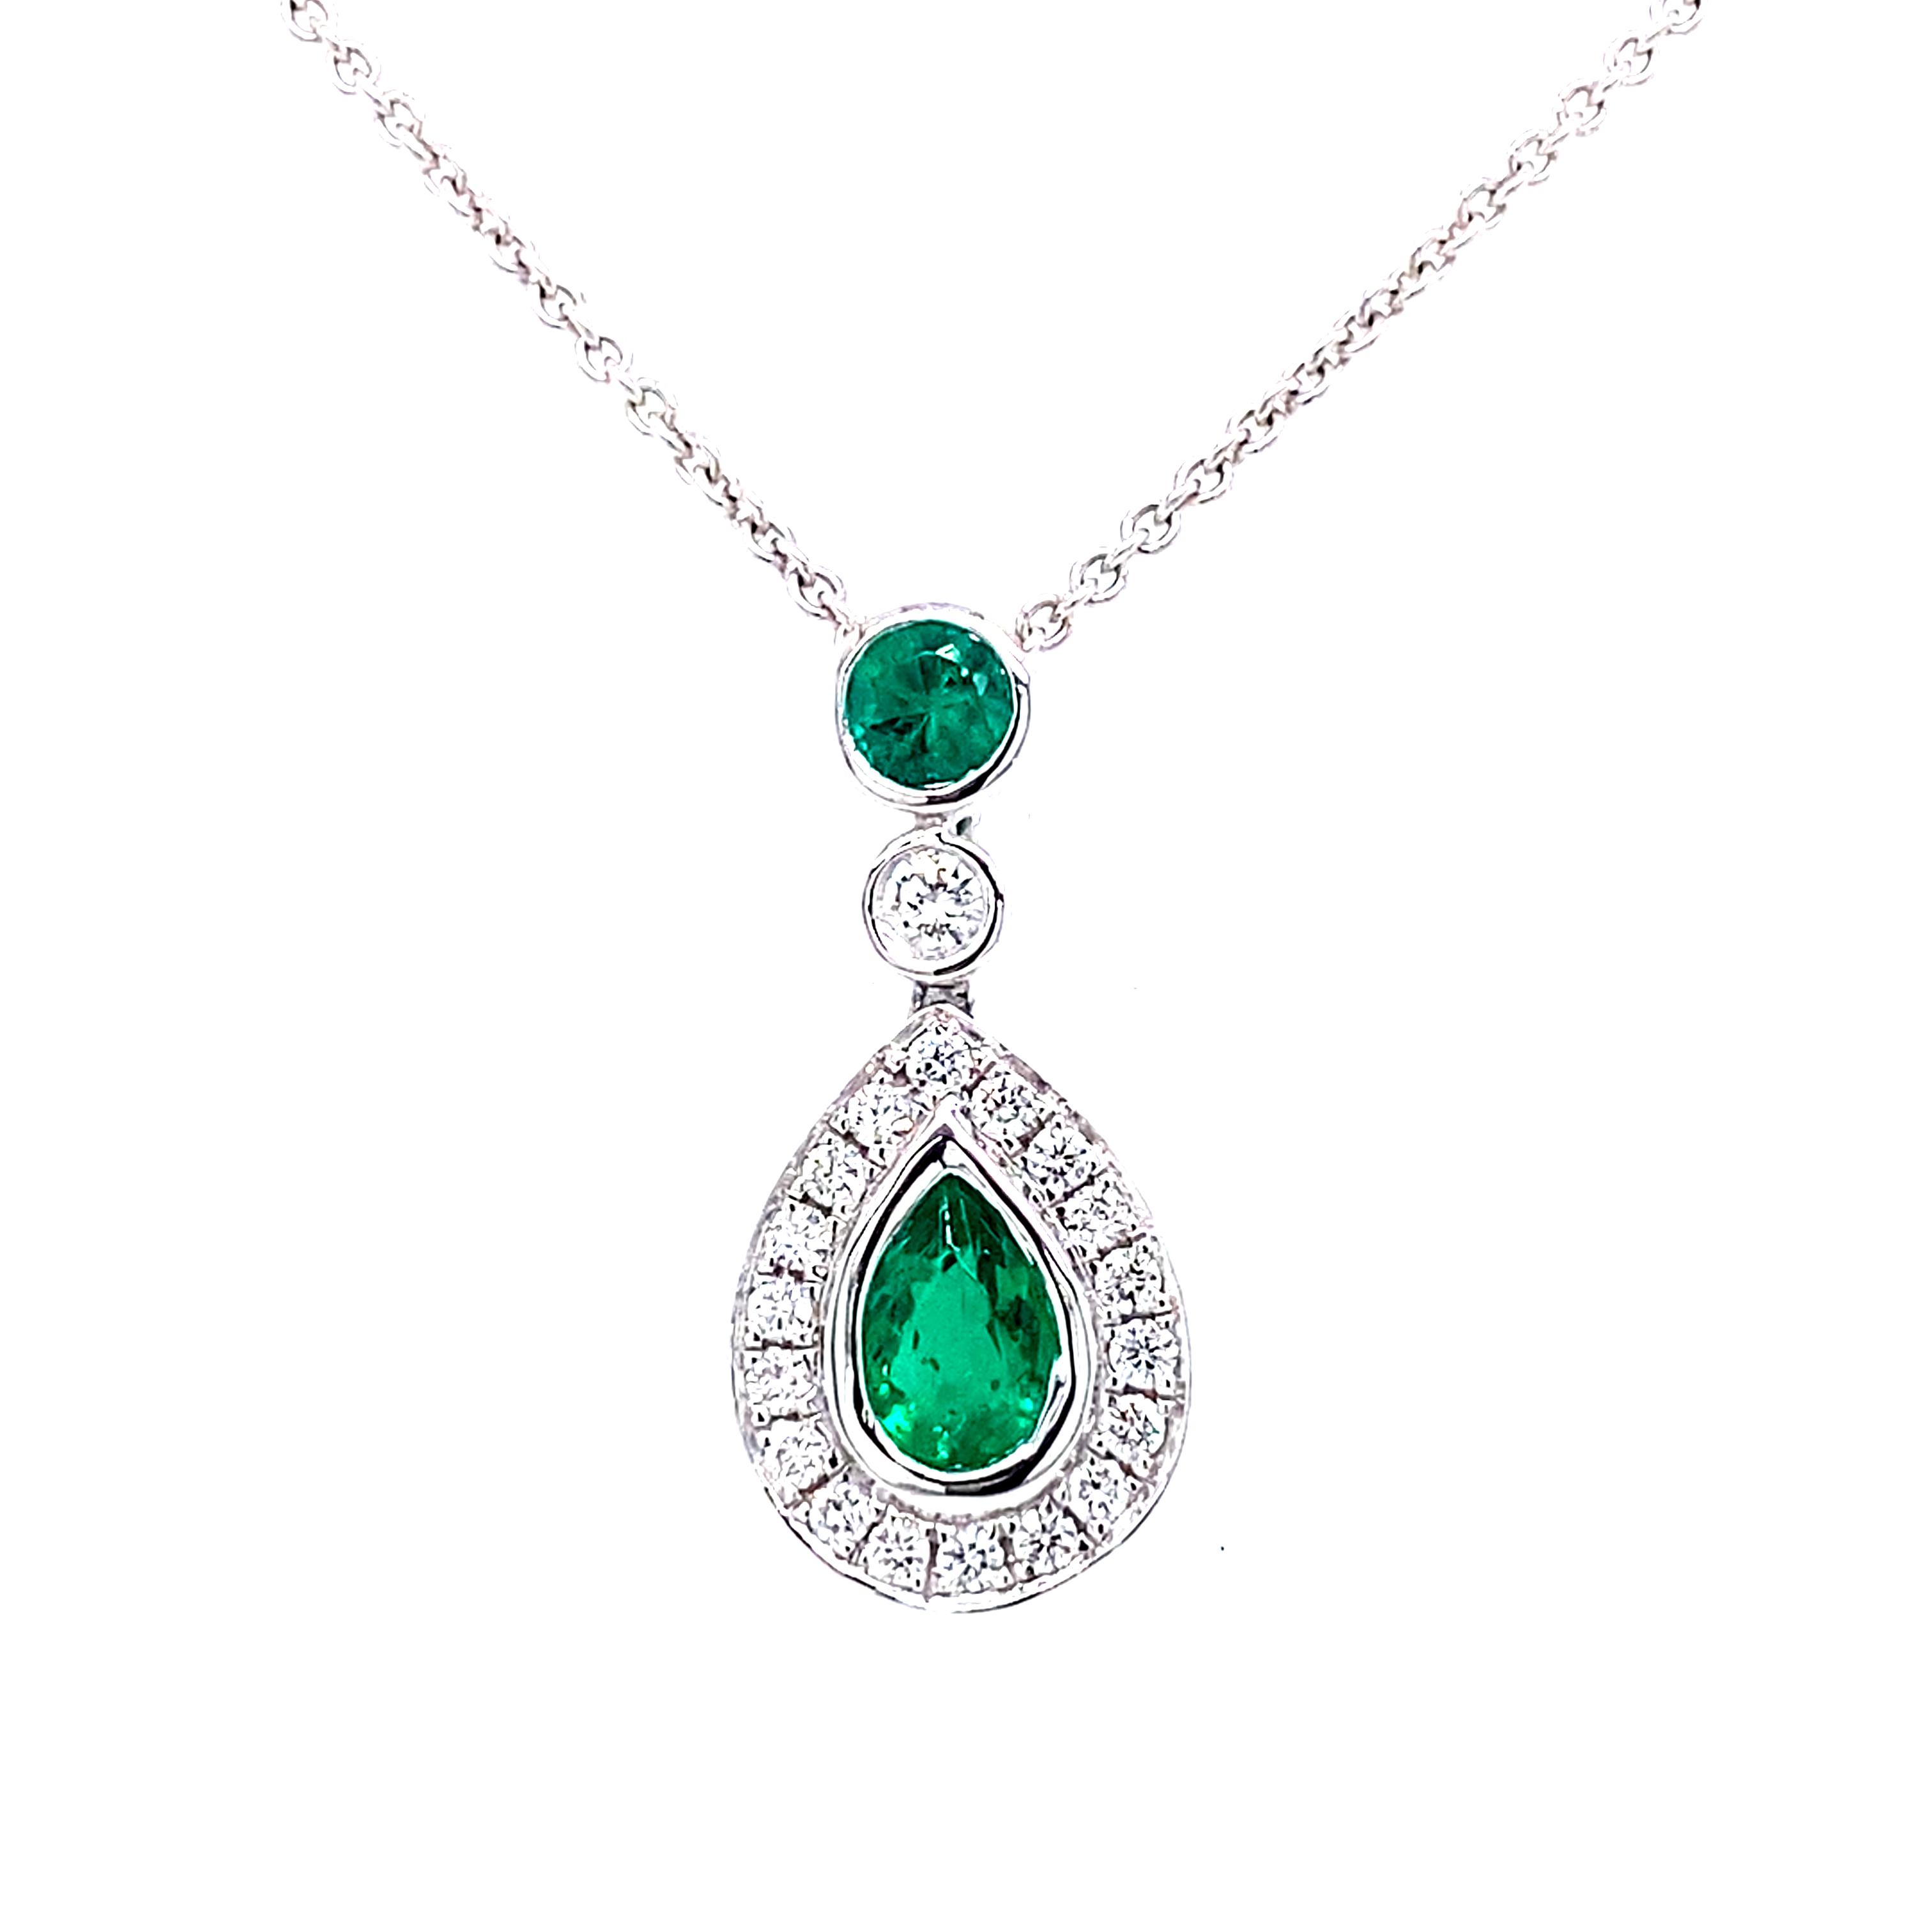 18ct White Gold Emerald and Diamond Pendant